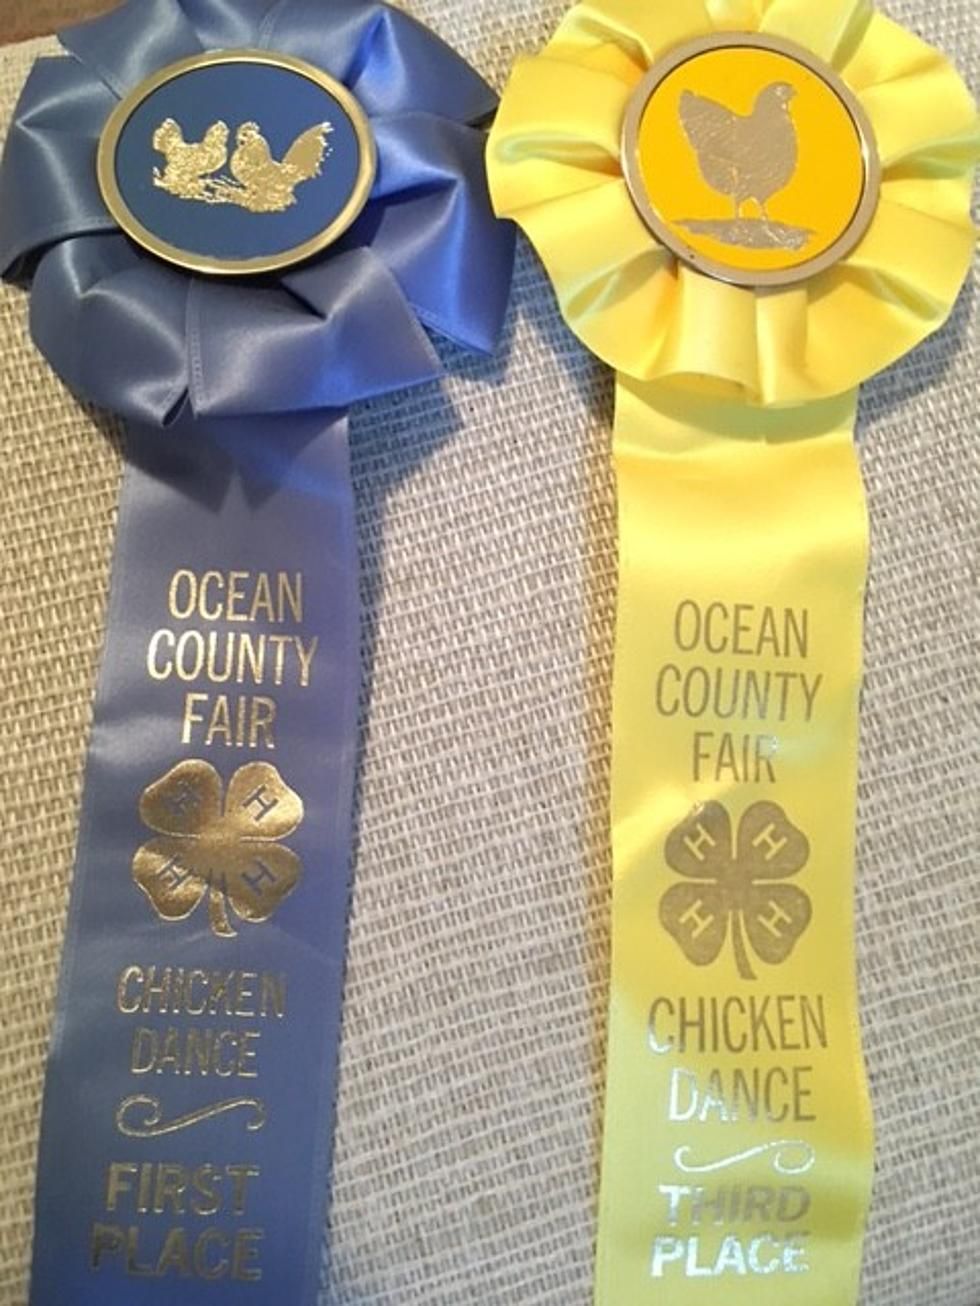 Fond Memories Of The Ocean County Fair